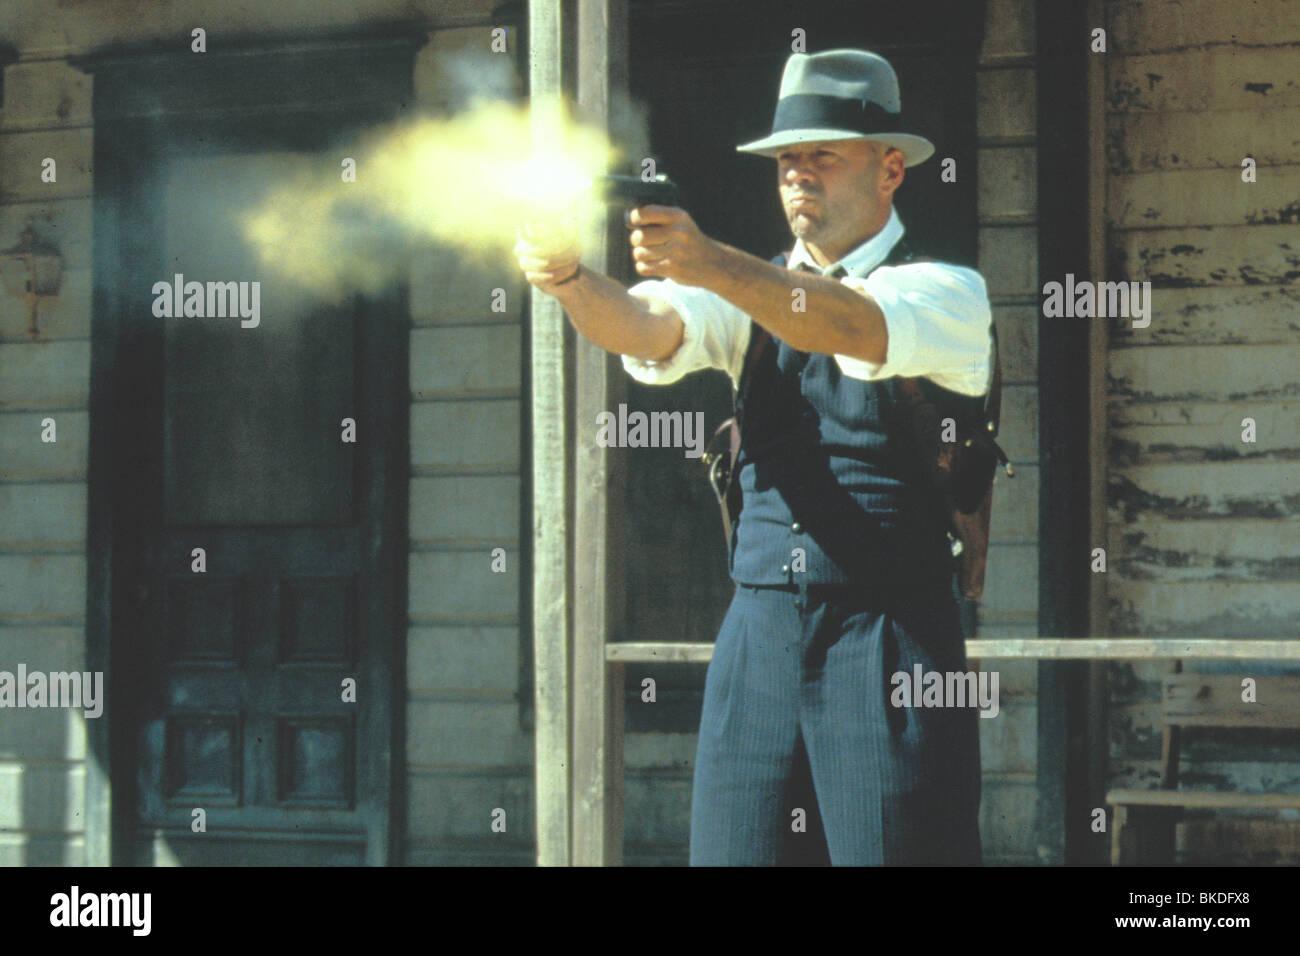 LAST MAN STANDING (1996) BRUCE WILLIS LAMA 010 - Stock Image